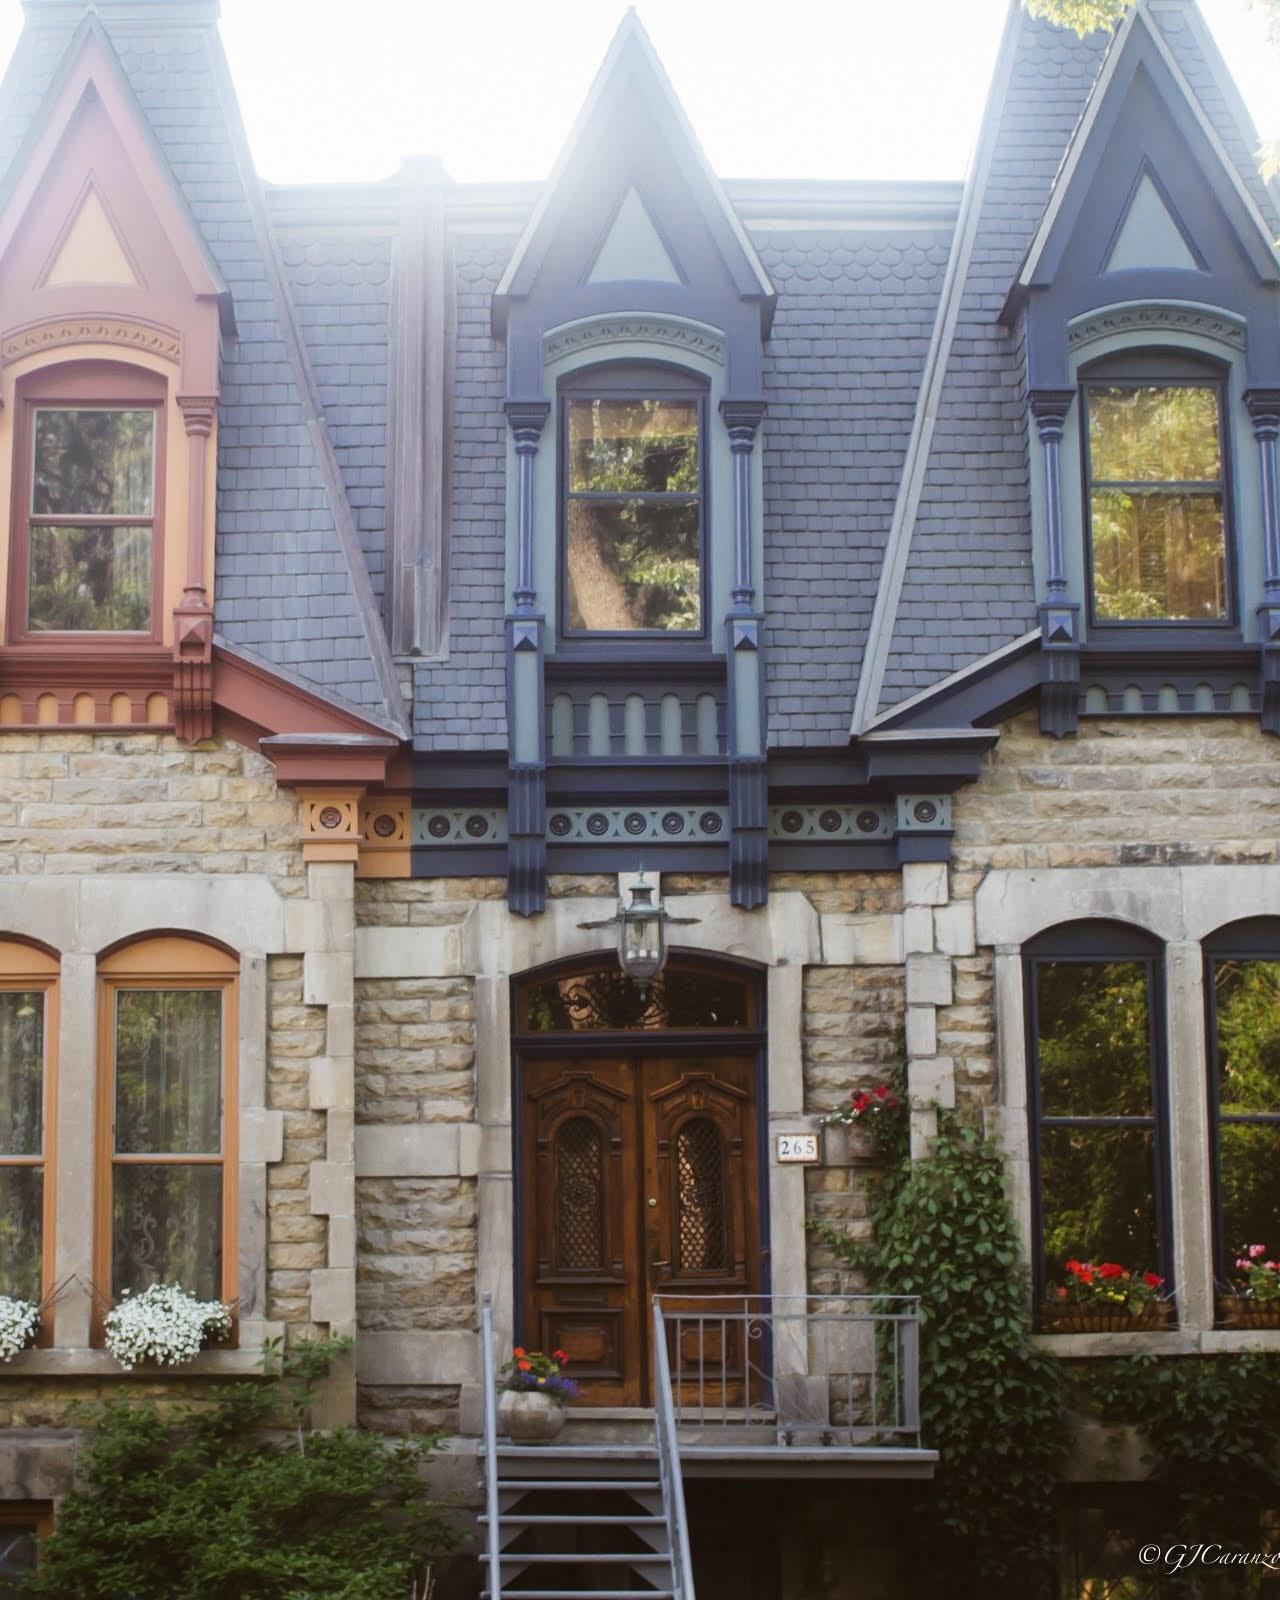 Short Day Trip From Ottawa, Ontario: Square Saint-Louis Montreal, Queubec